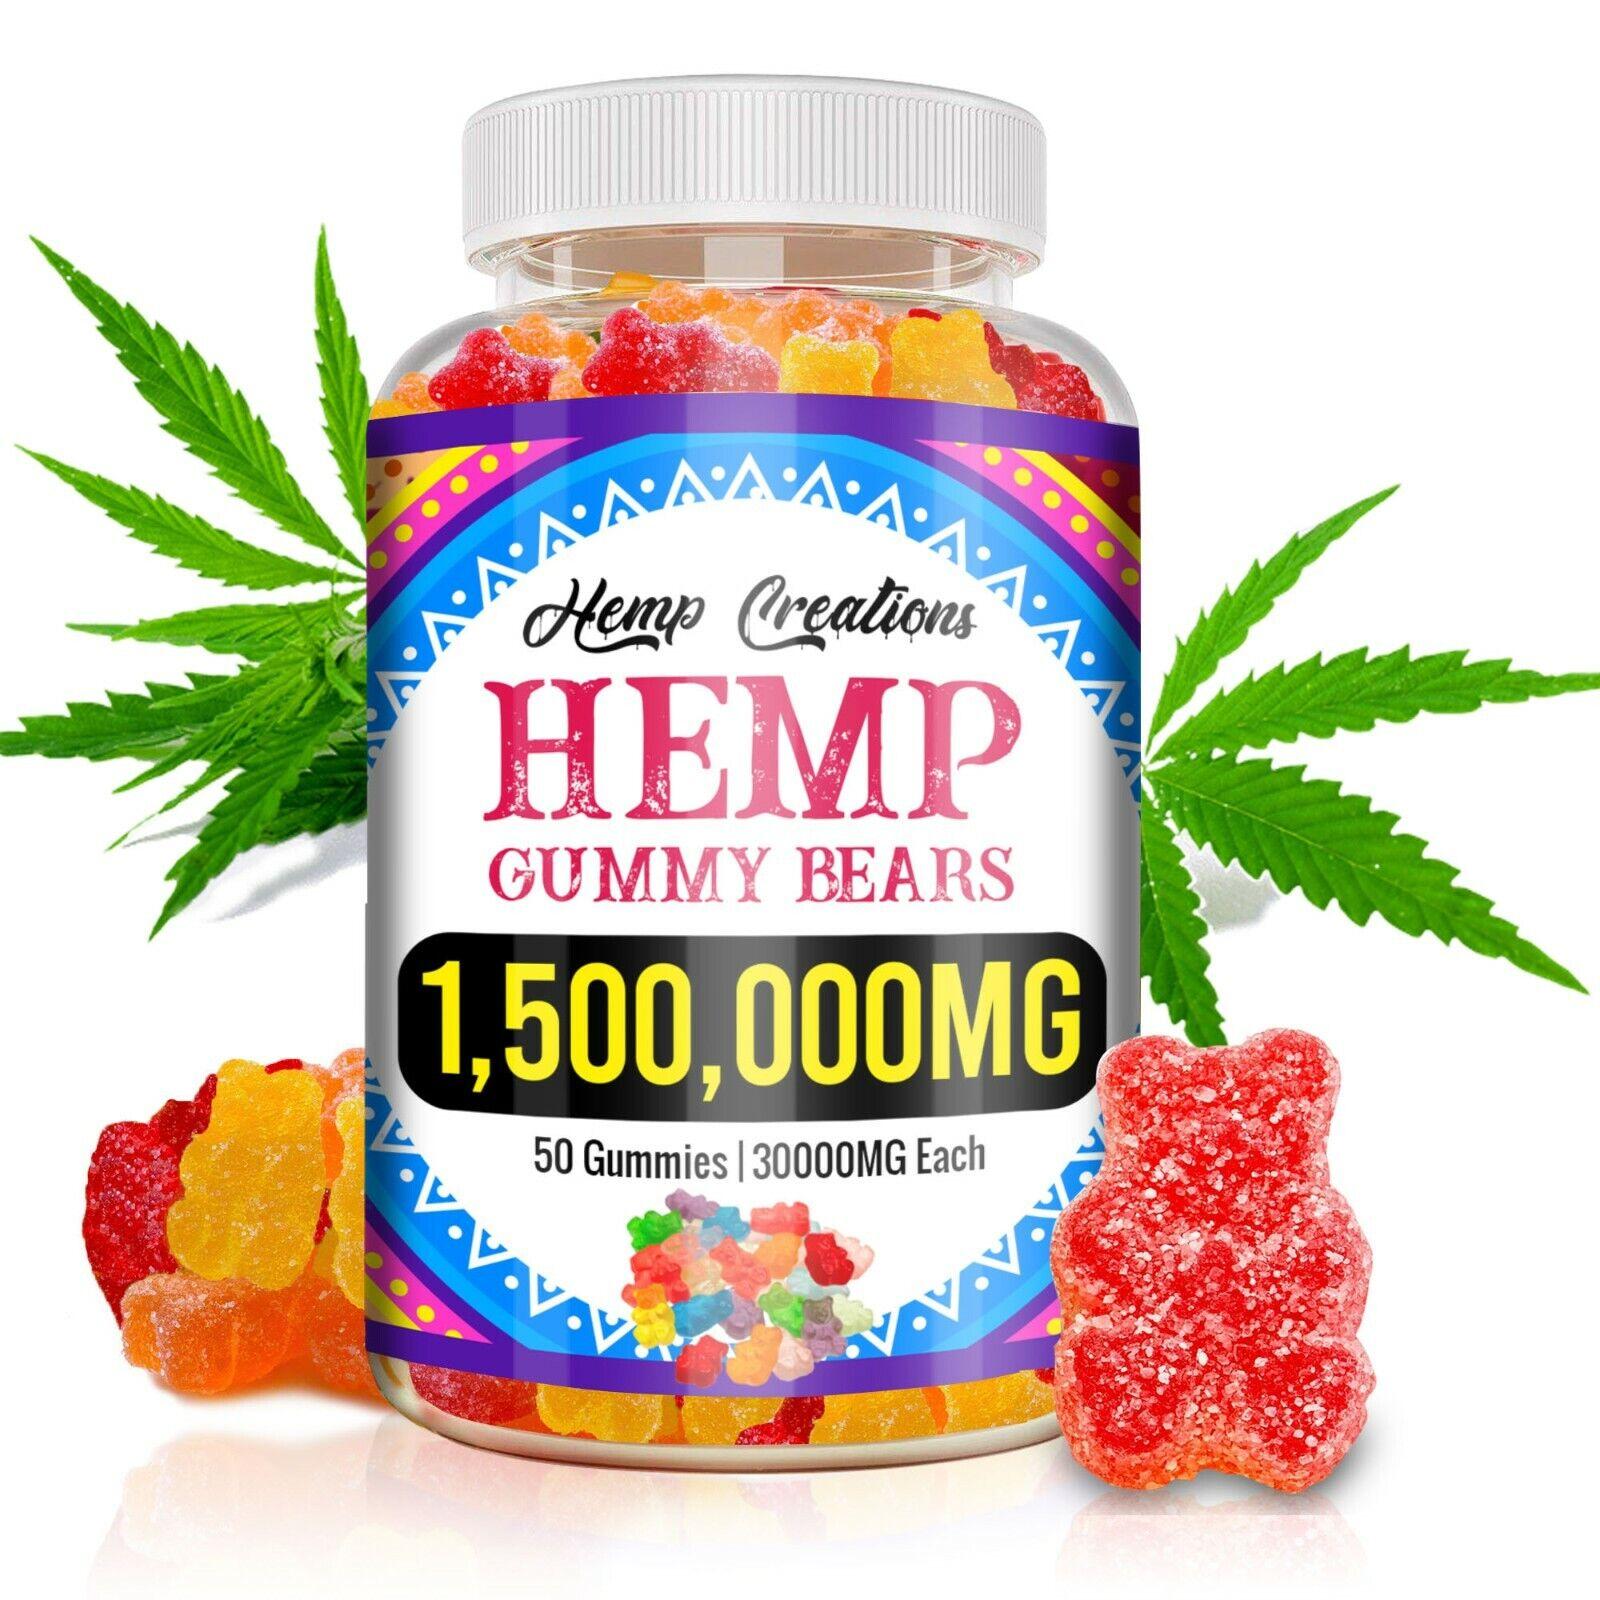 Natural Organic Hèmp Natural Gummiès, Pain, Relaxation, Stress Relief, Insomnia